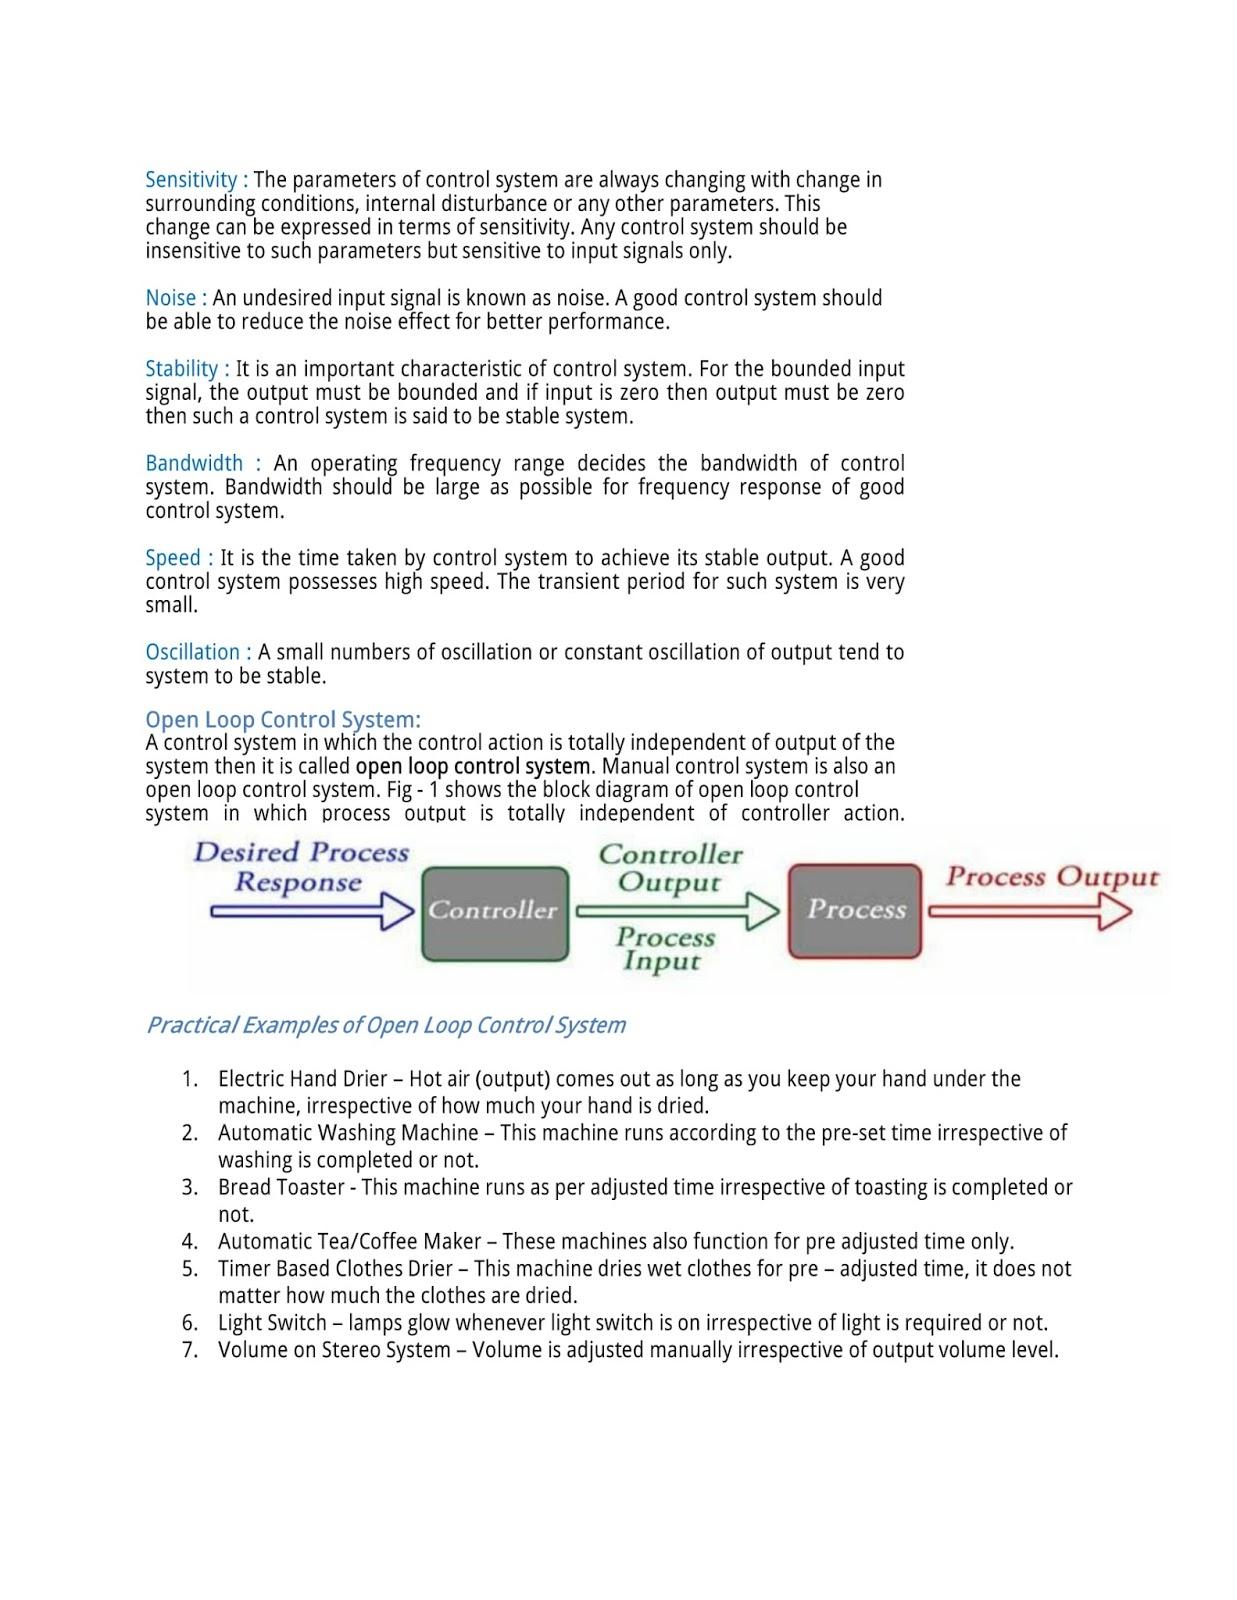 Famous Block Reduction Techniques In Control System Frieze ...